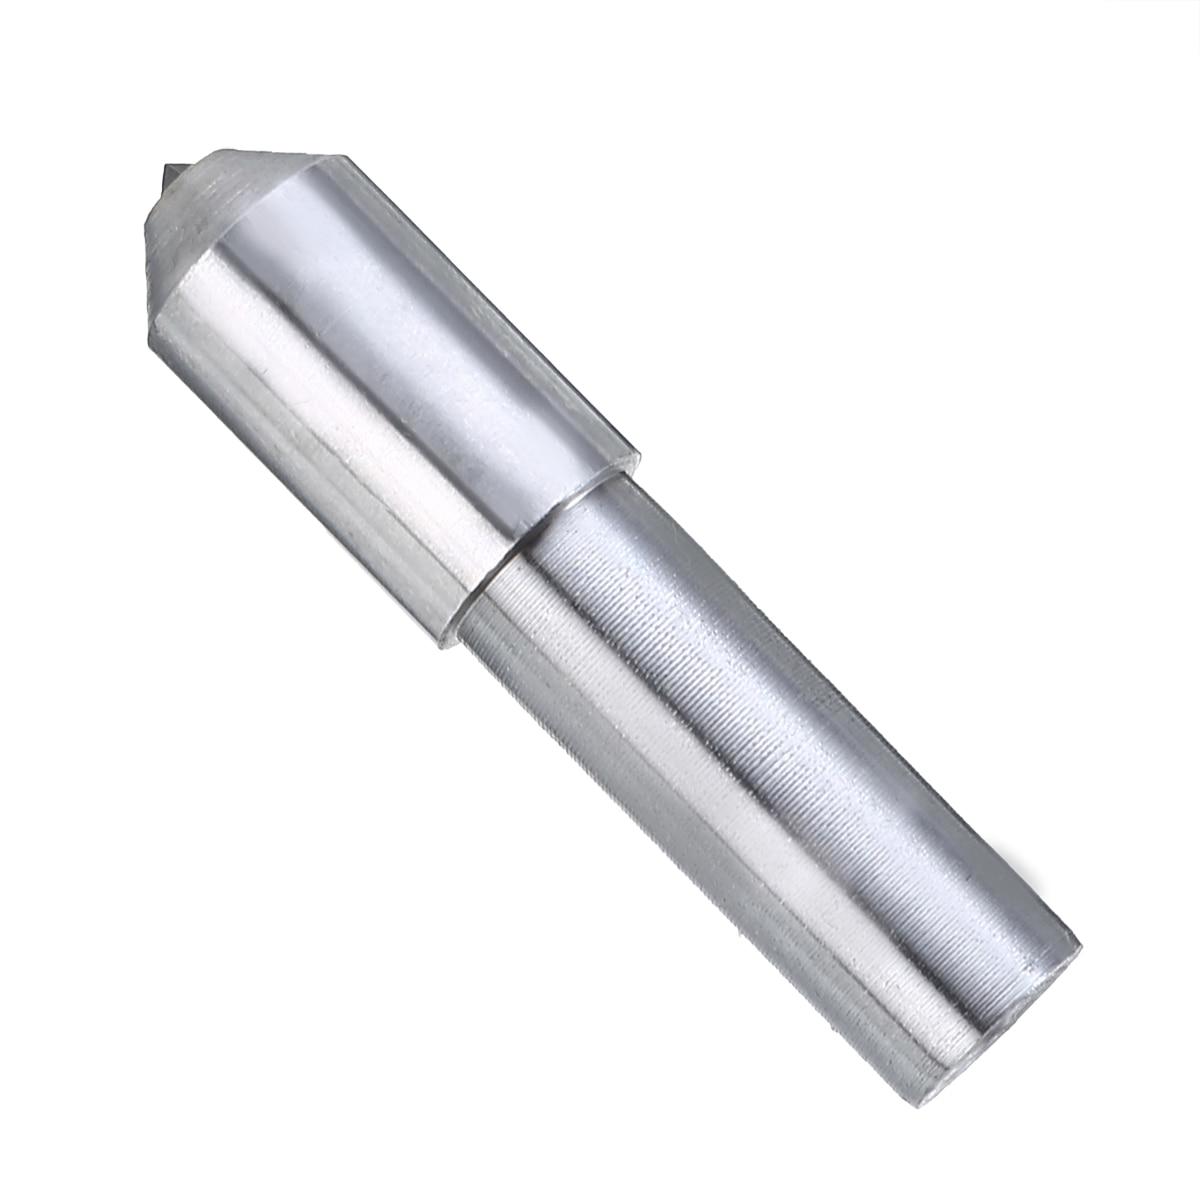 Phenomenal Grinding 11Mm Diamond Dresser Pen Abrasive Grinding Dressing Customarchery Wood Chair Design Ideas Customarcherynet